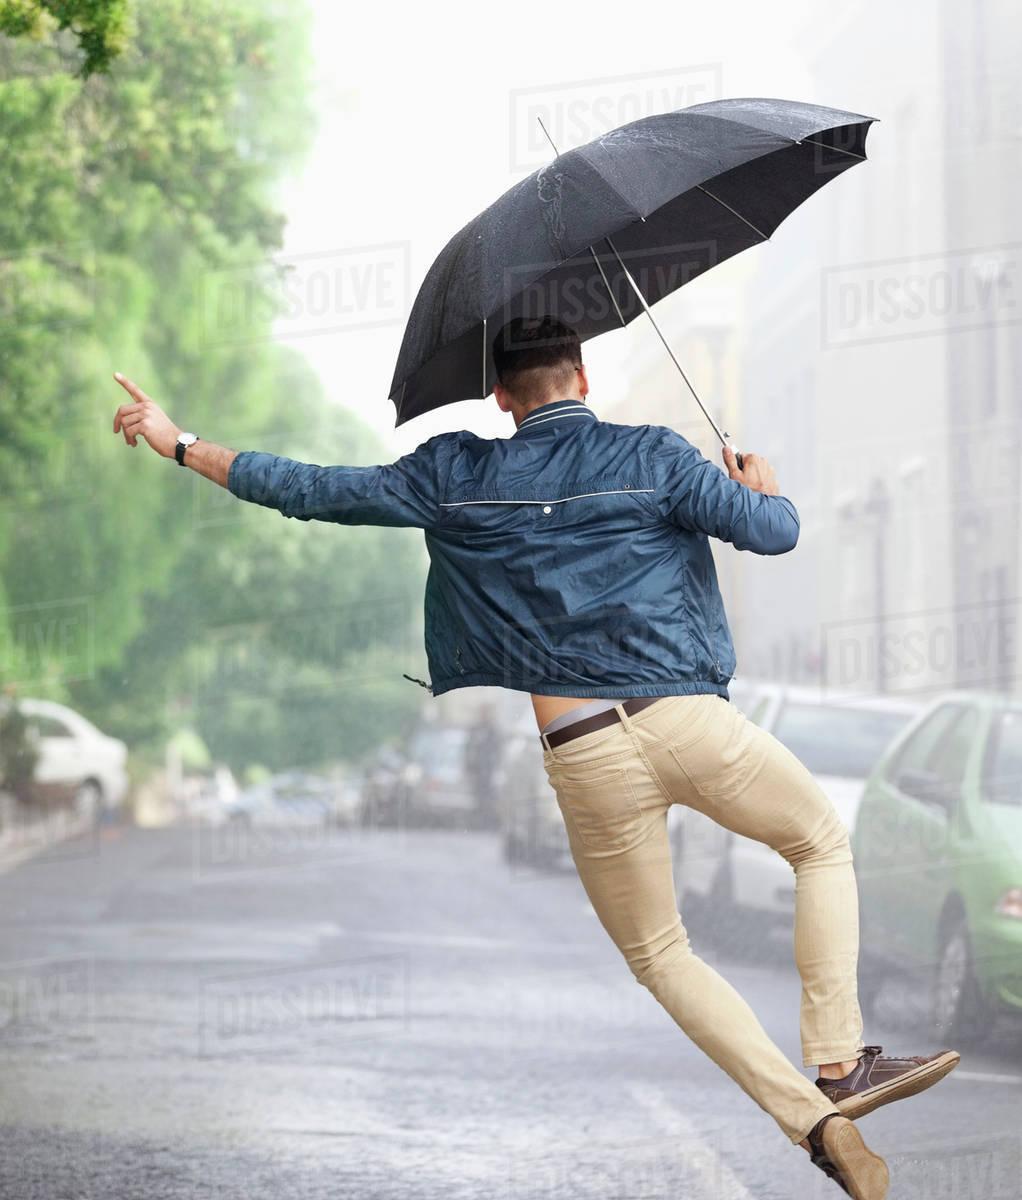 man dancing with umbrella in rainy street stock photo dissolve